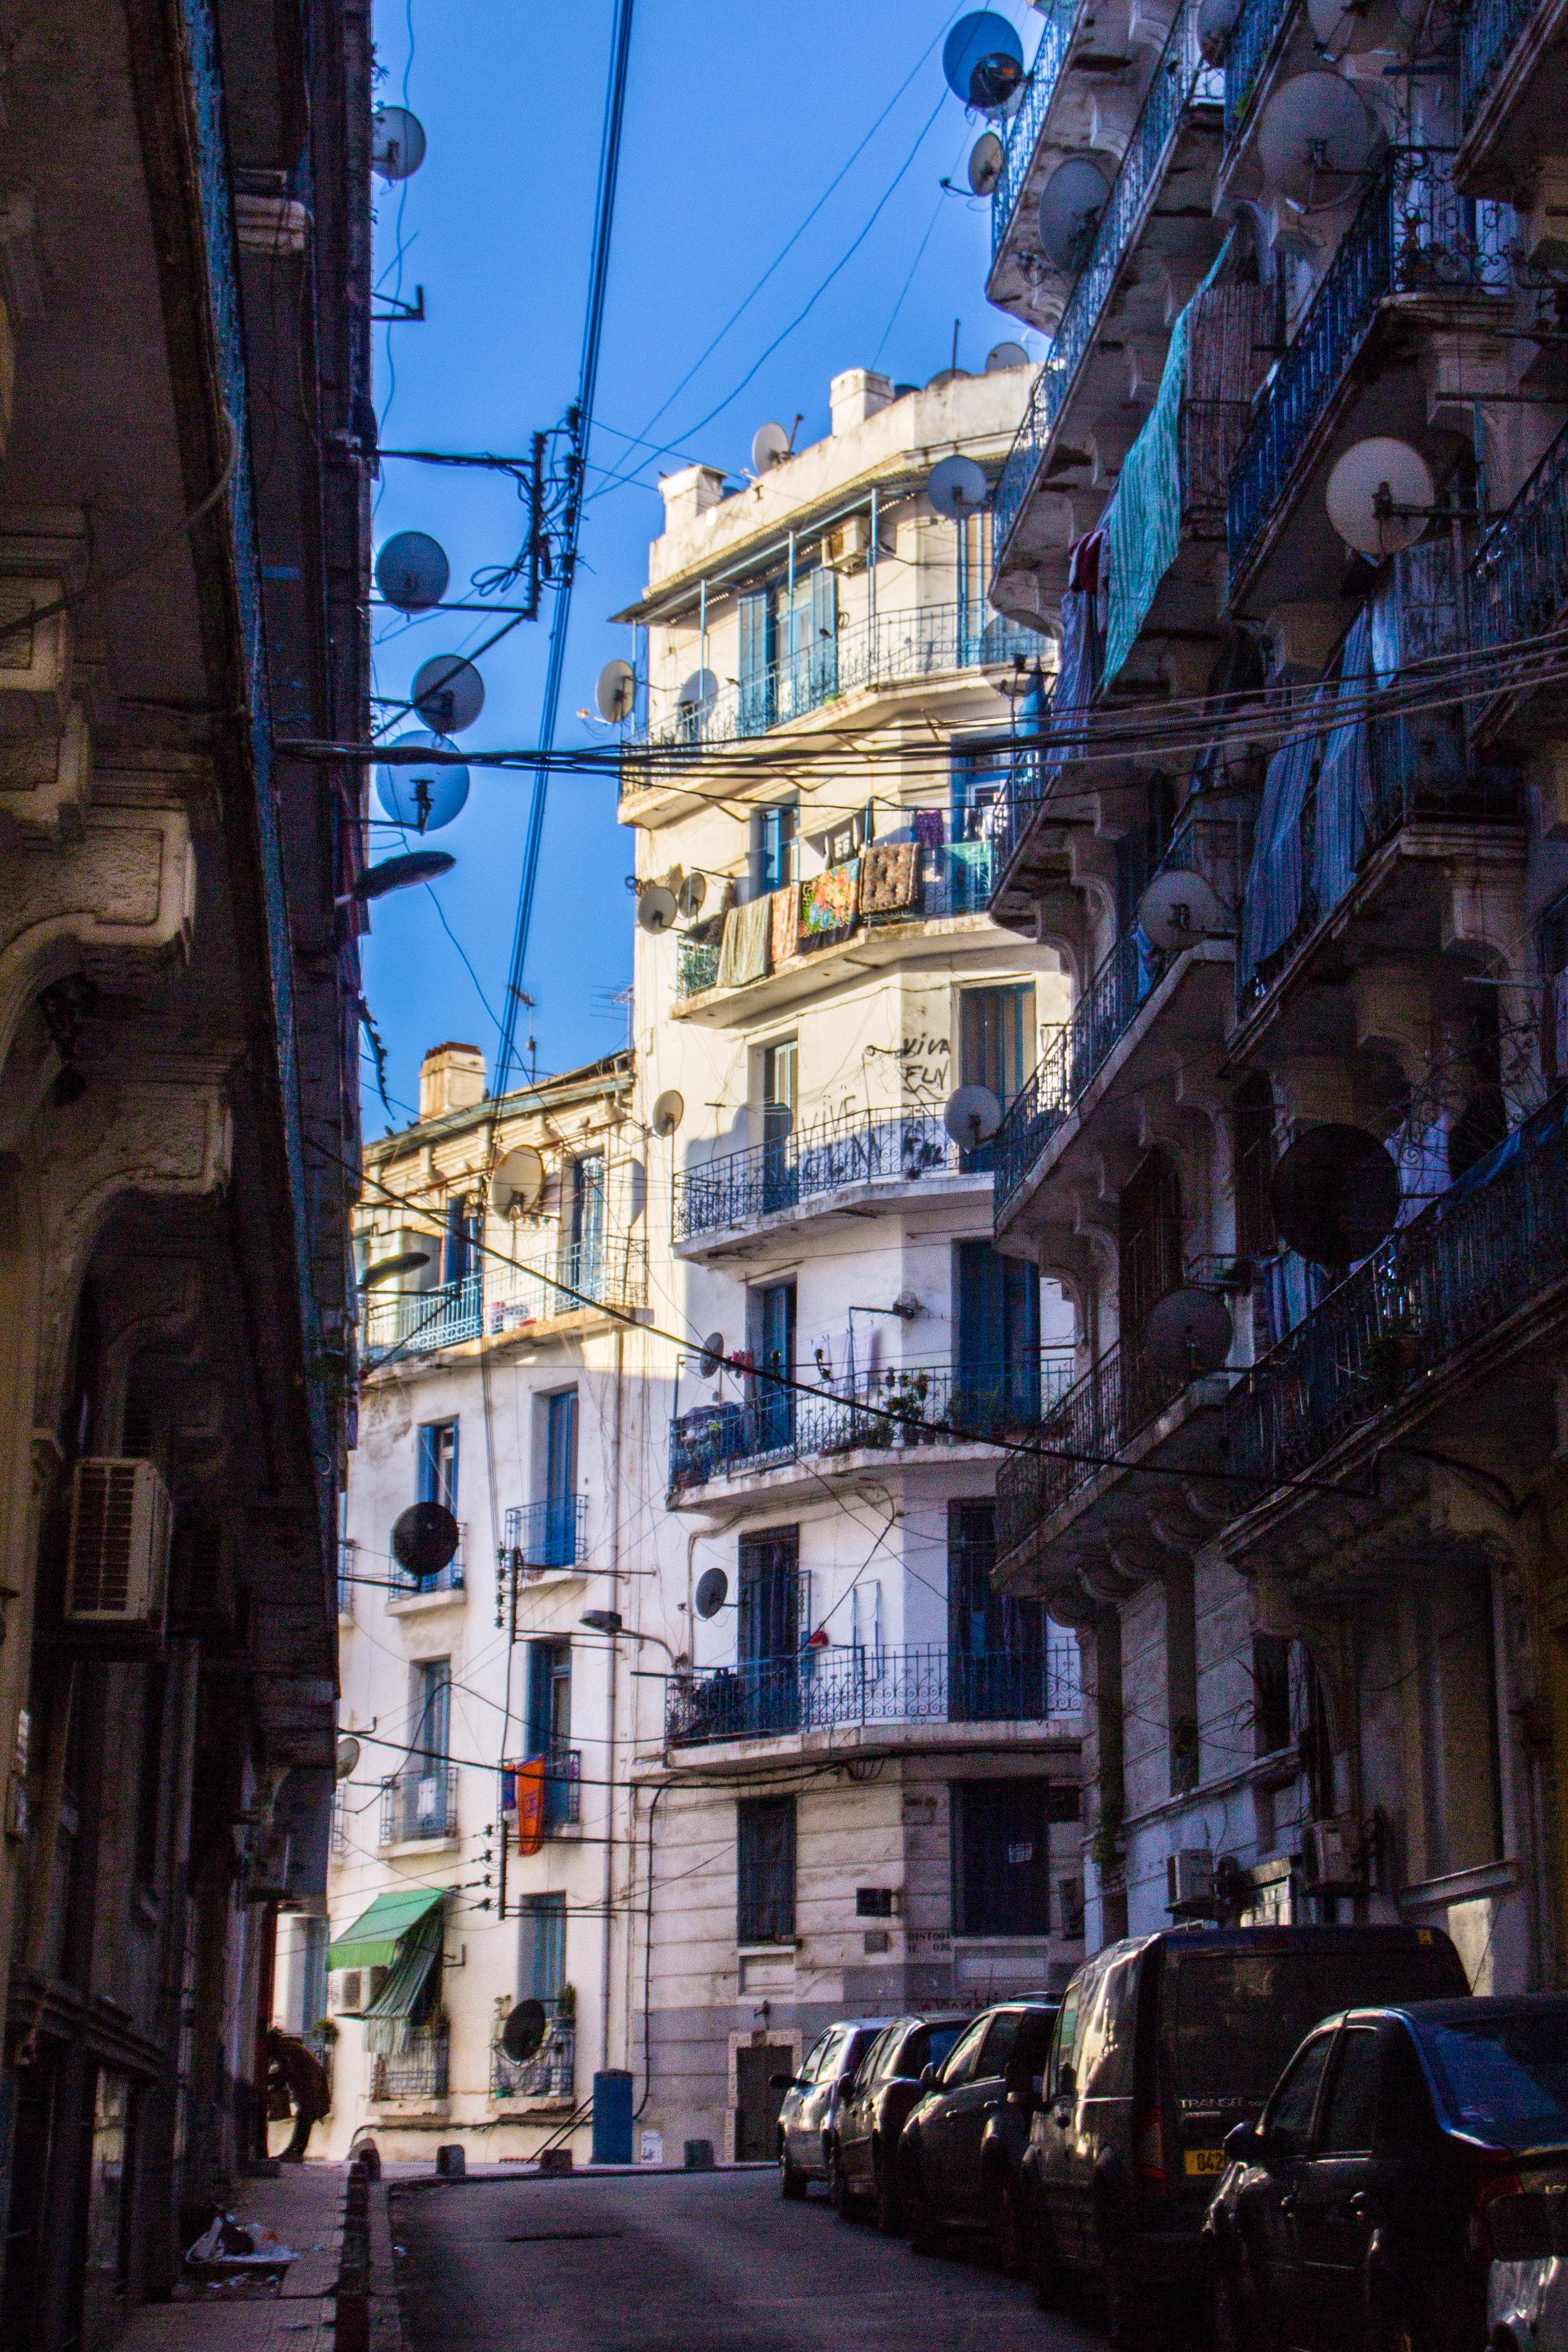 street-photography-algiers-algeria-5.jpg